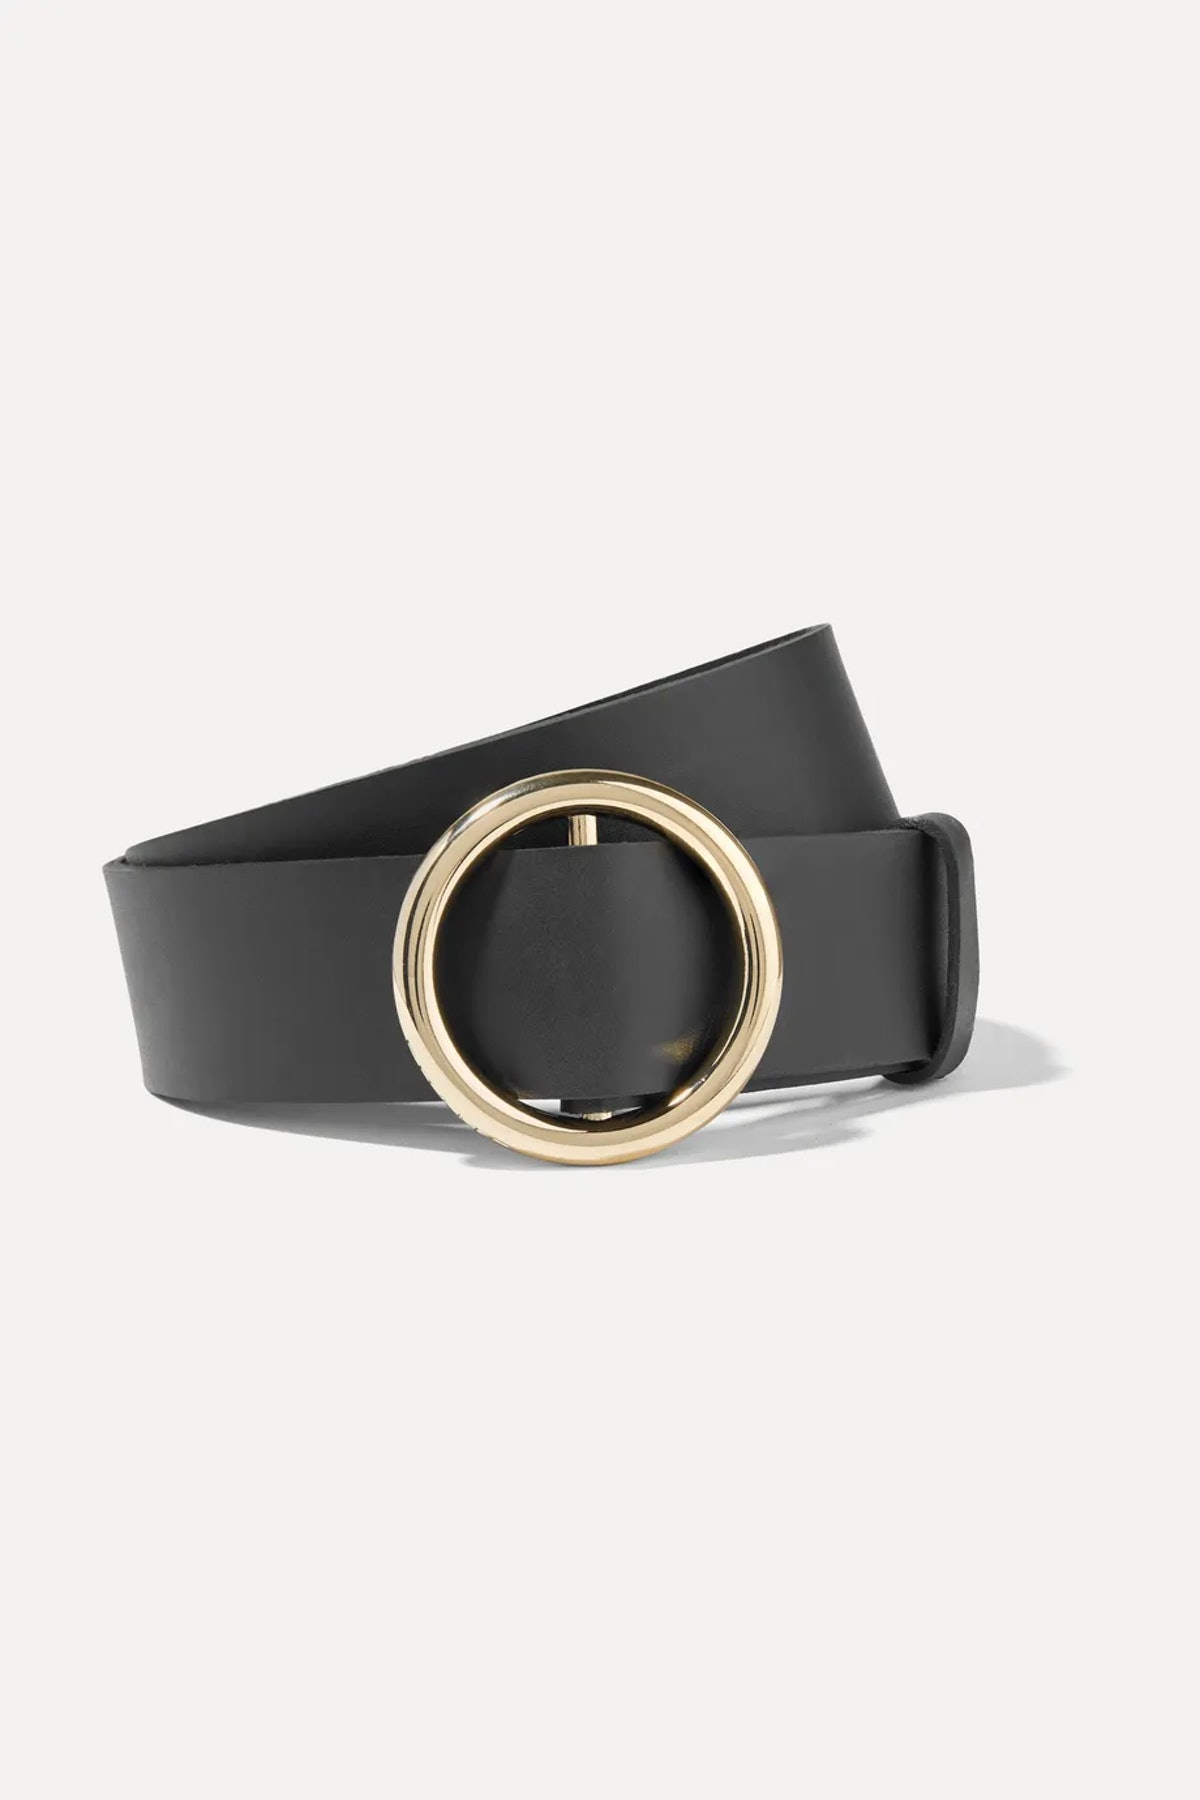 Le Circle Leather Belt